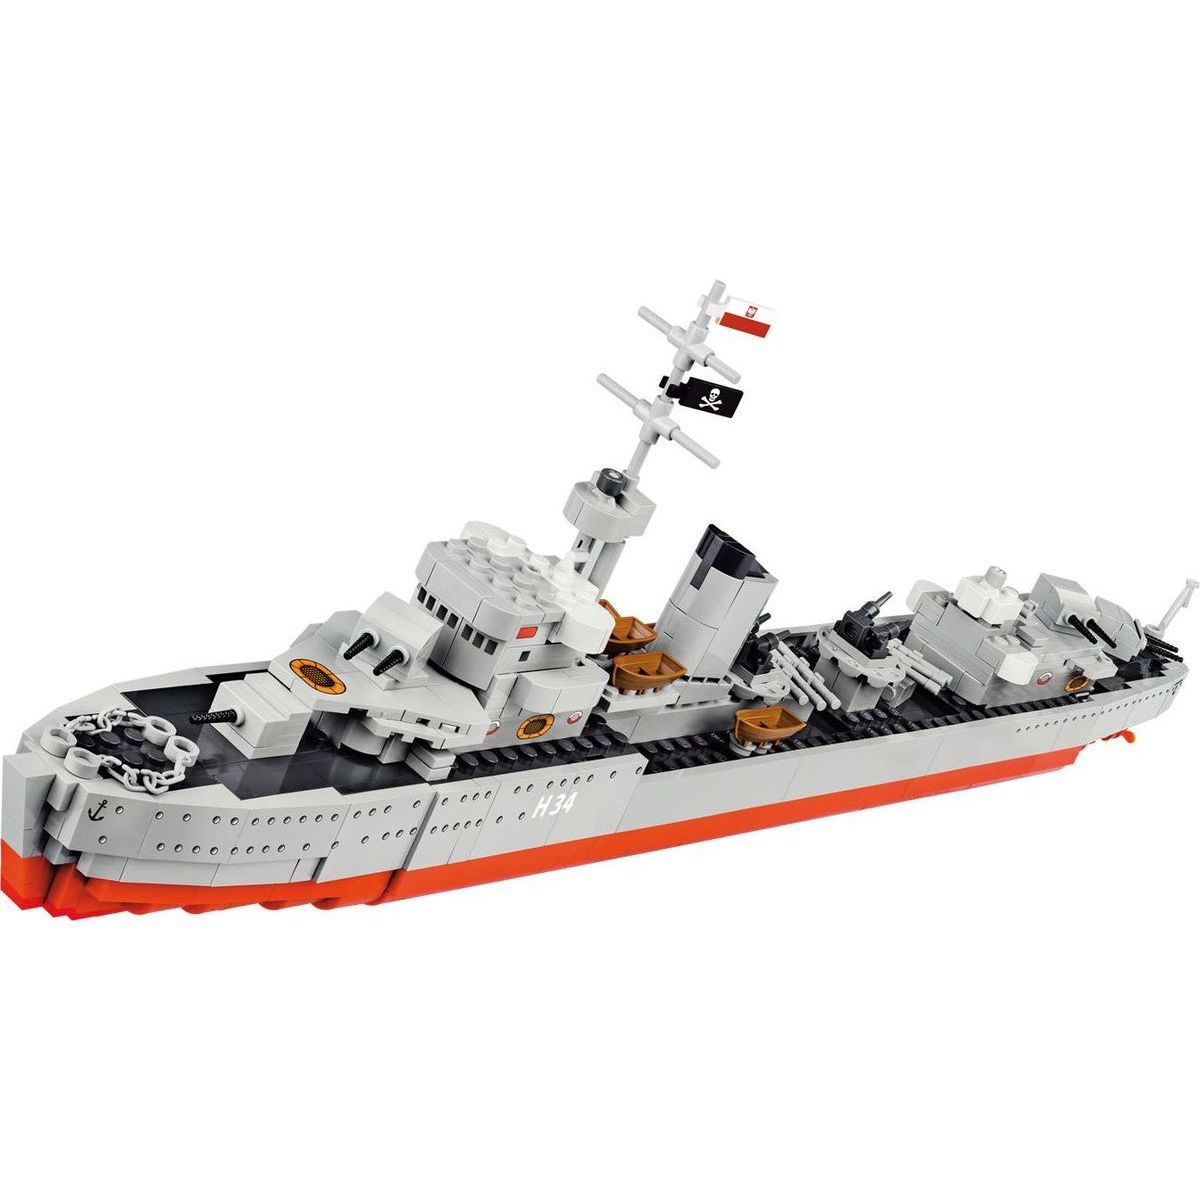 Cobi 3080 World of Warships – ORP Blyskawica, 1:200, 680 k